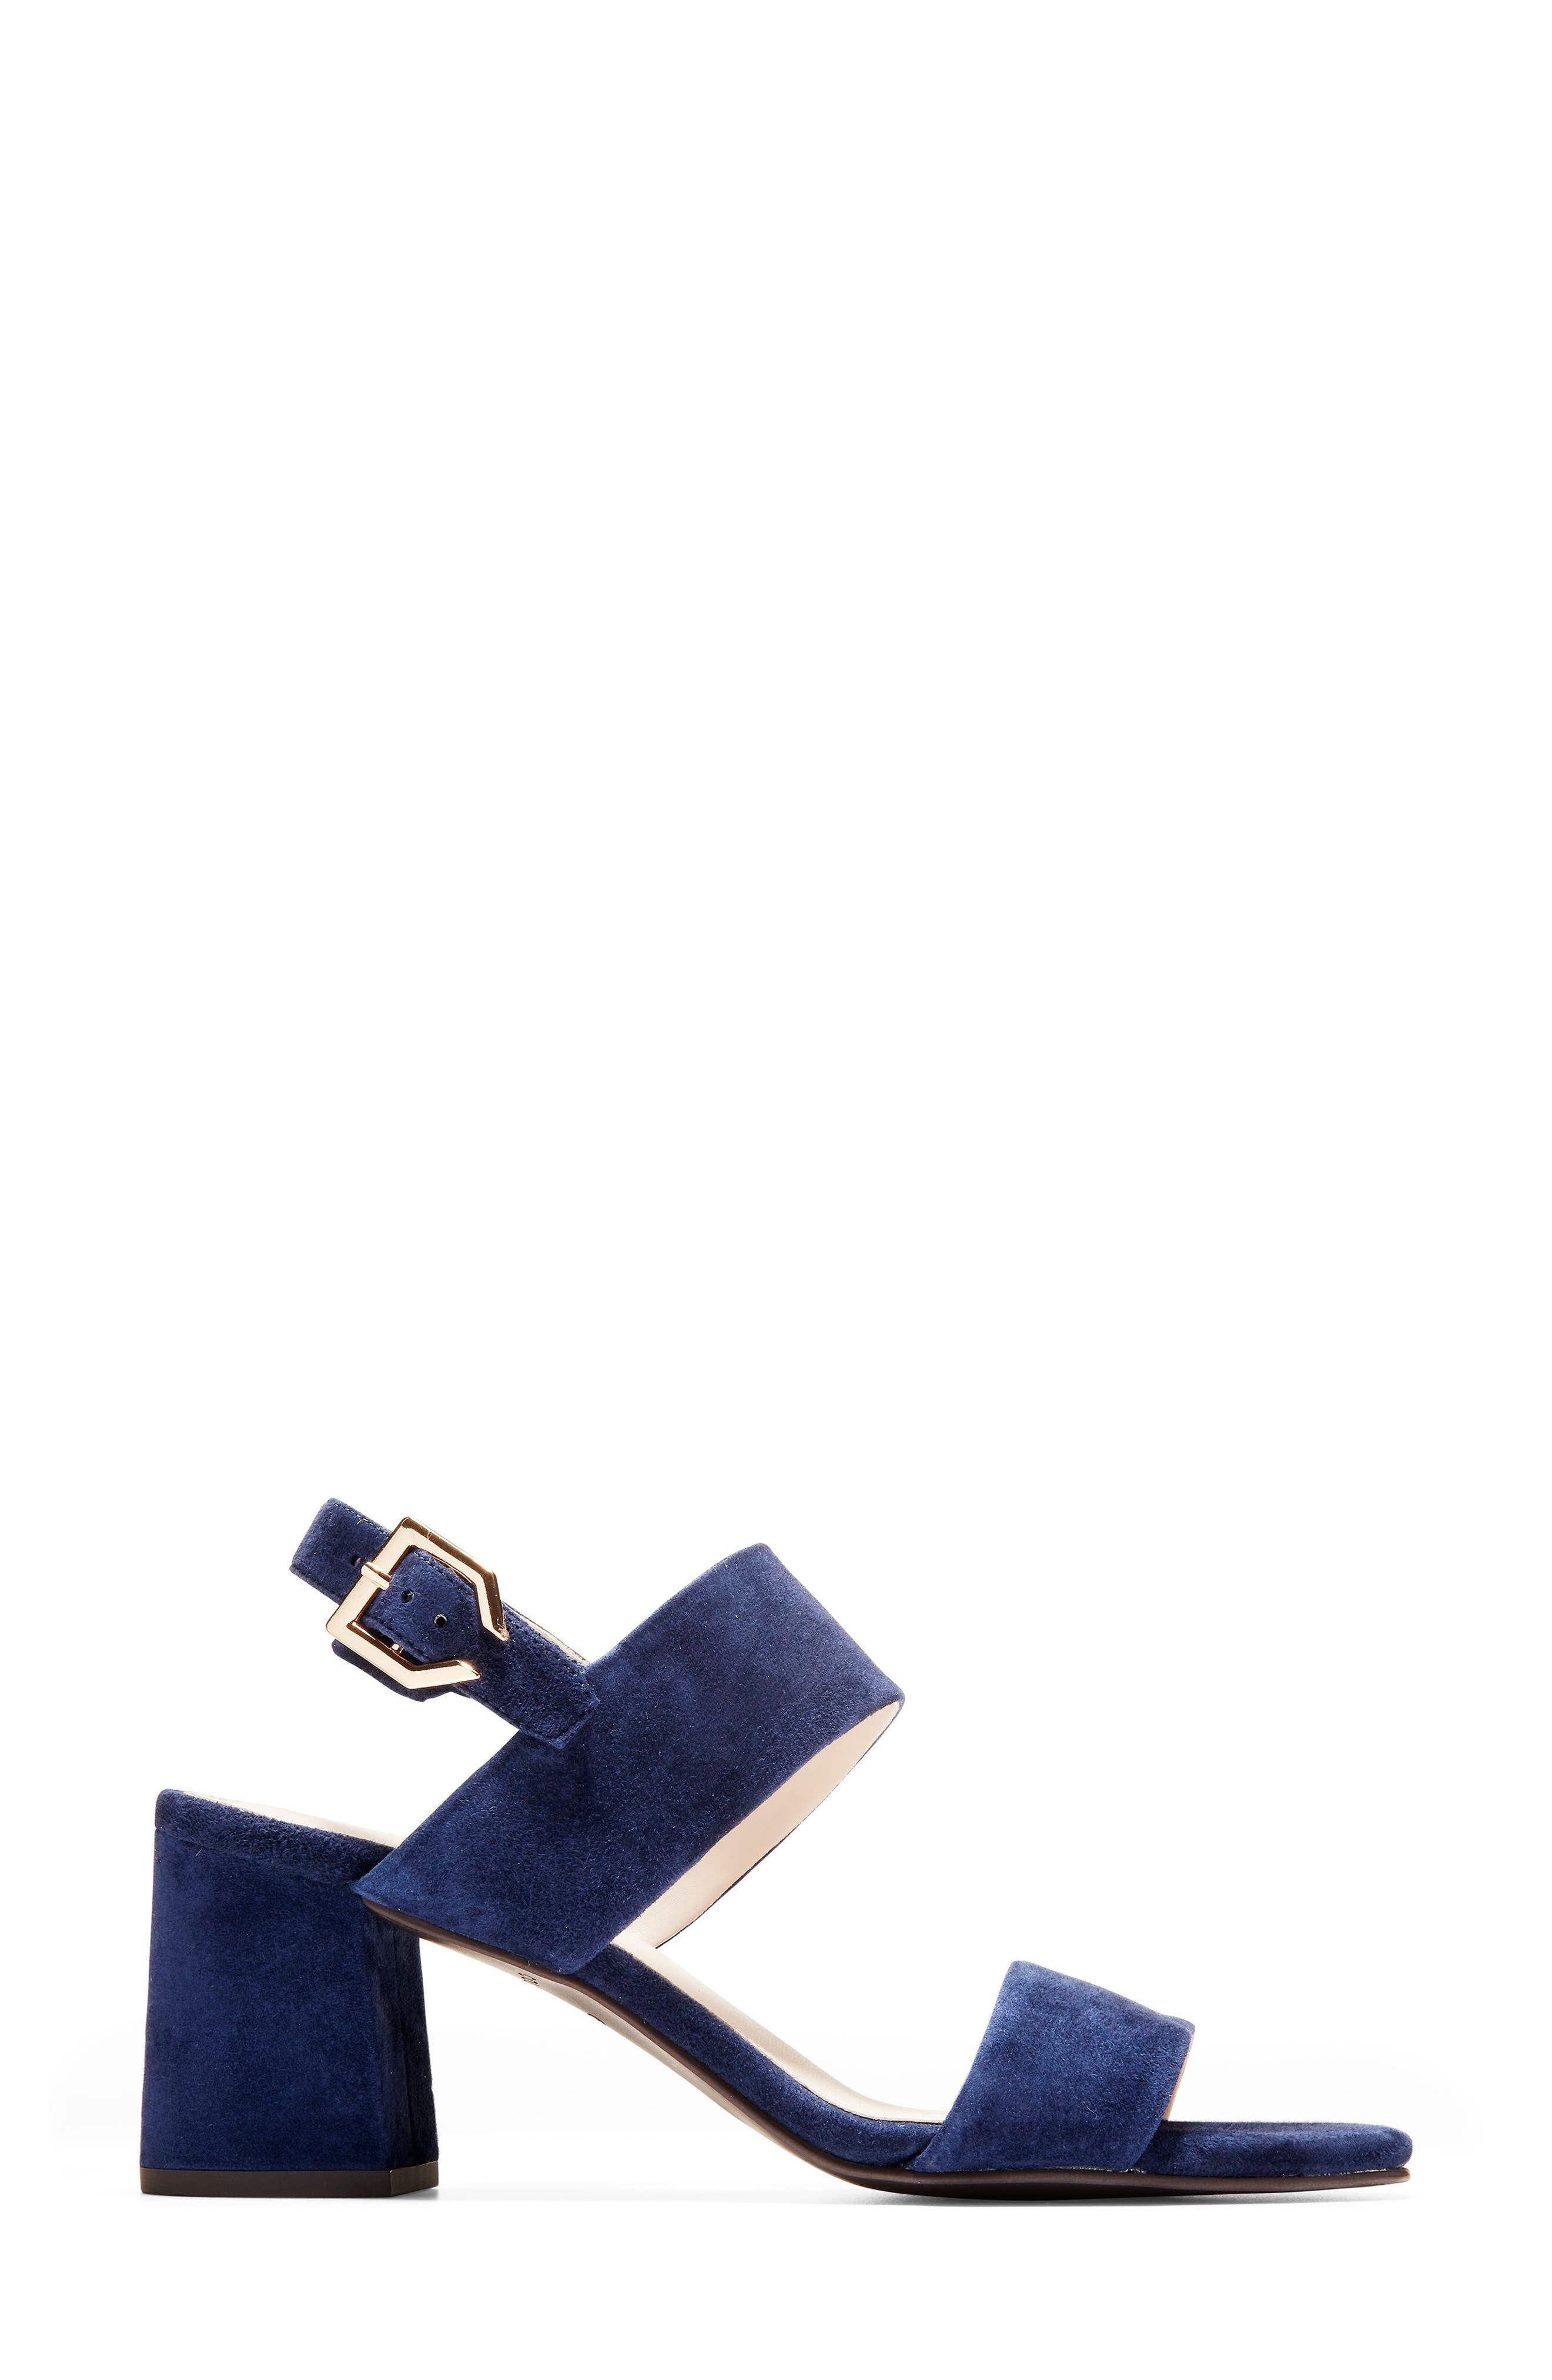 COLE HAAN, Avani Block Heel Sandal, Alternate thumbnail 3, color, MARINE BLUE SUEDE